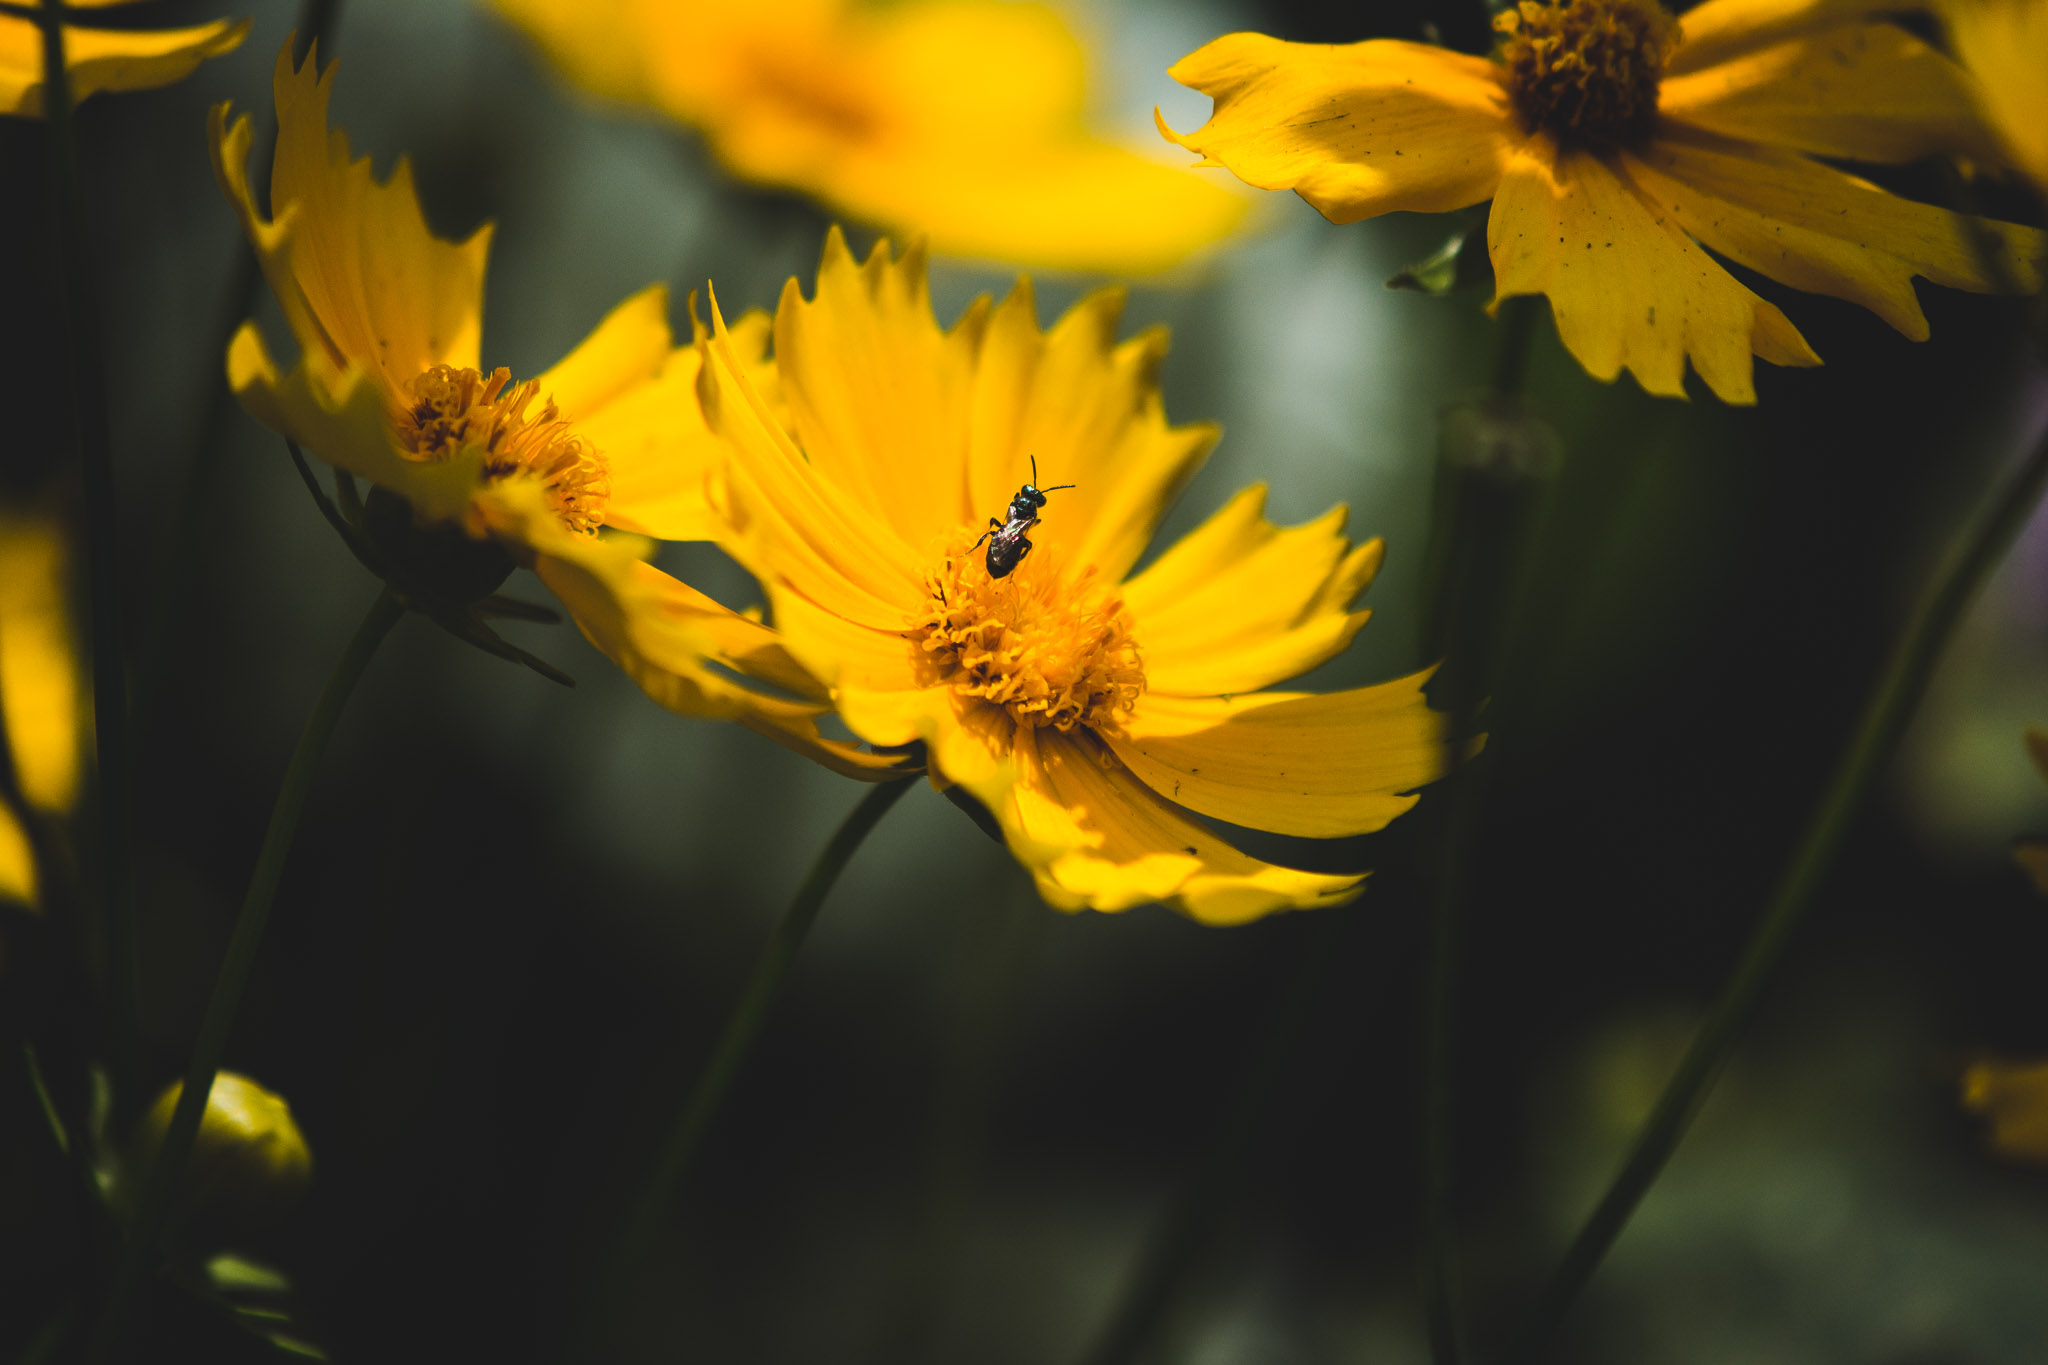 SycamoreLane Photography-13